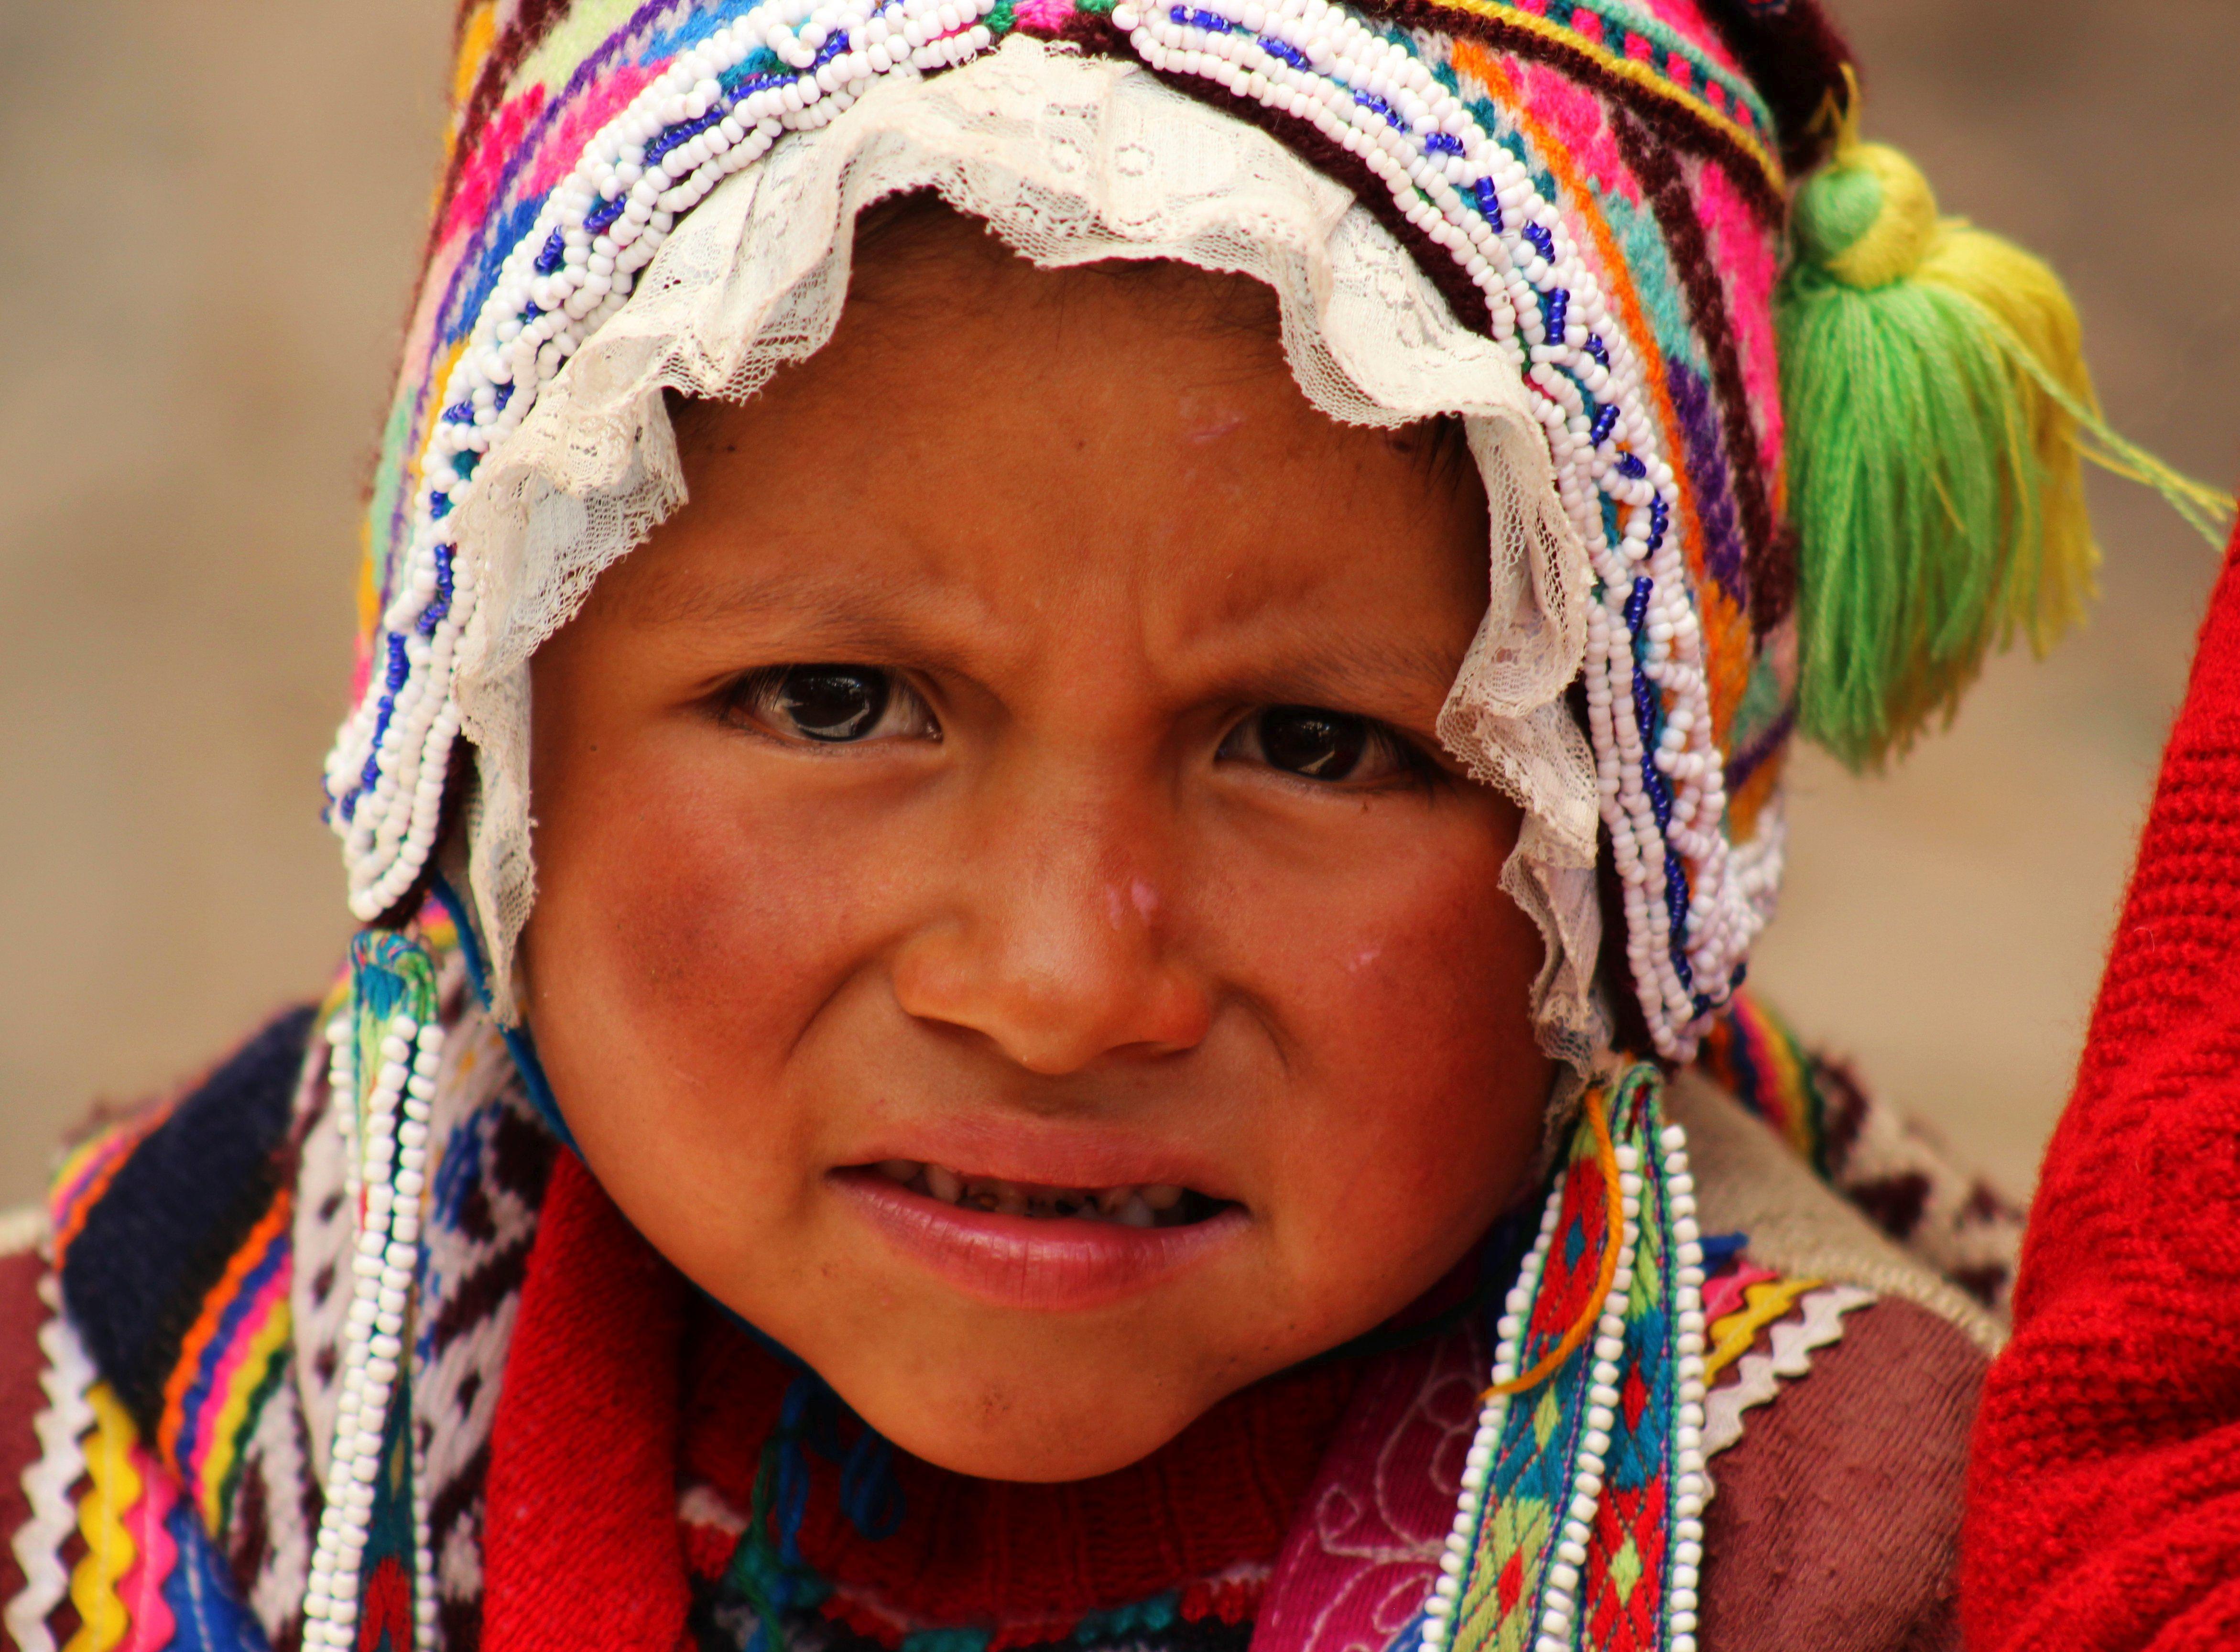 Peru - Szent Völgy., piac Pisacban. Fotó: Papp Éva